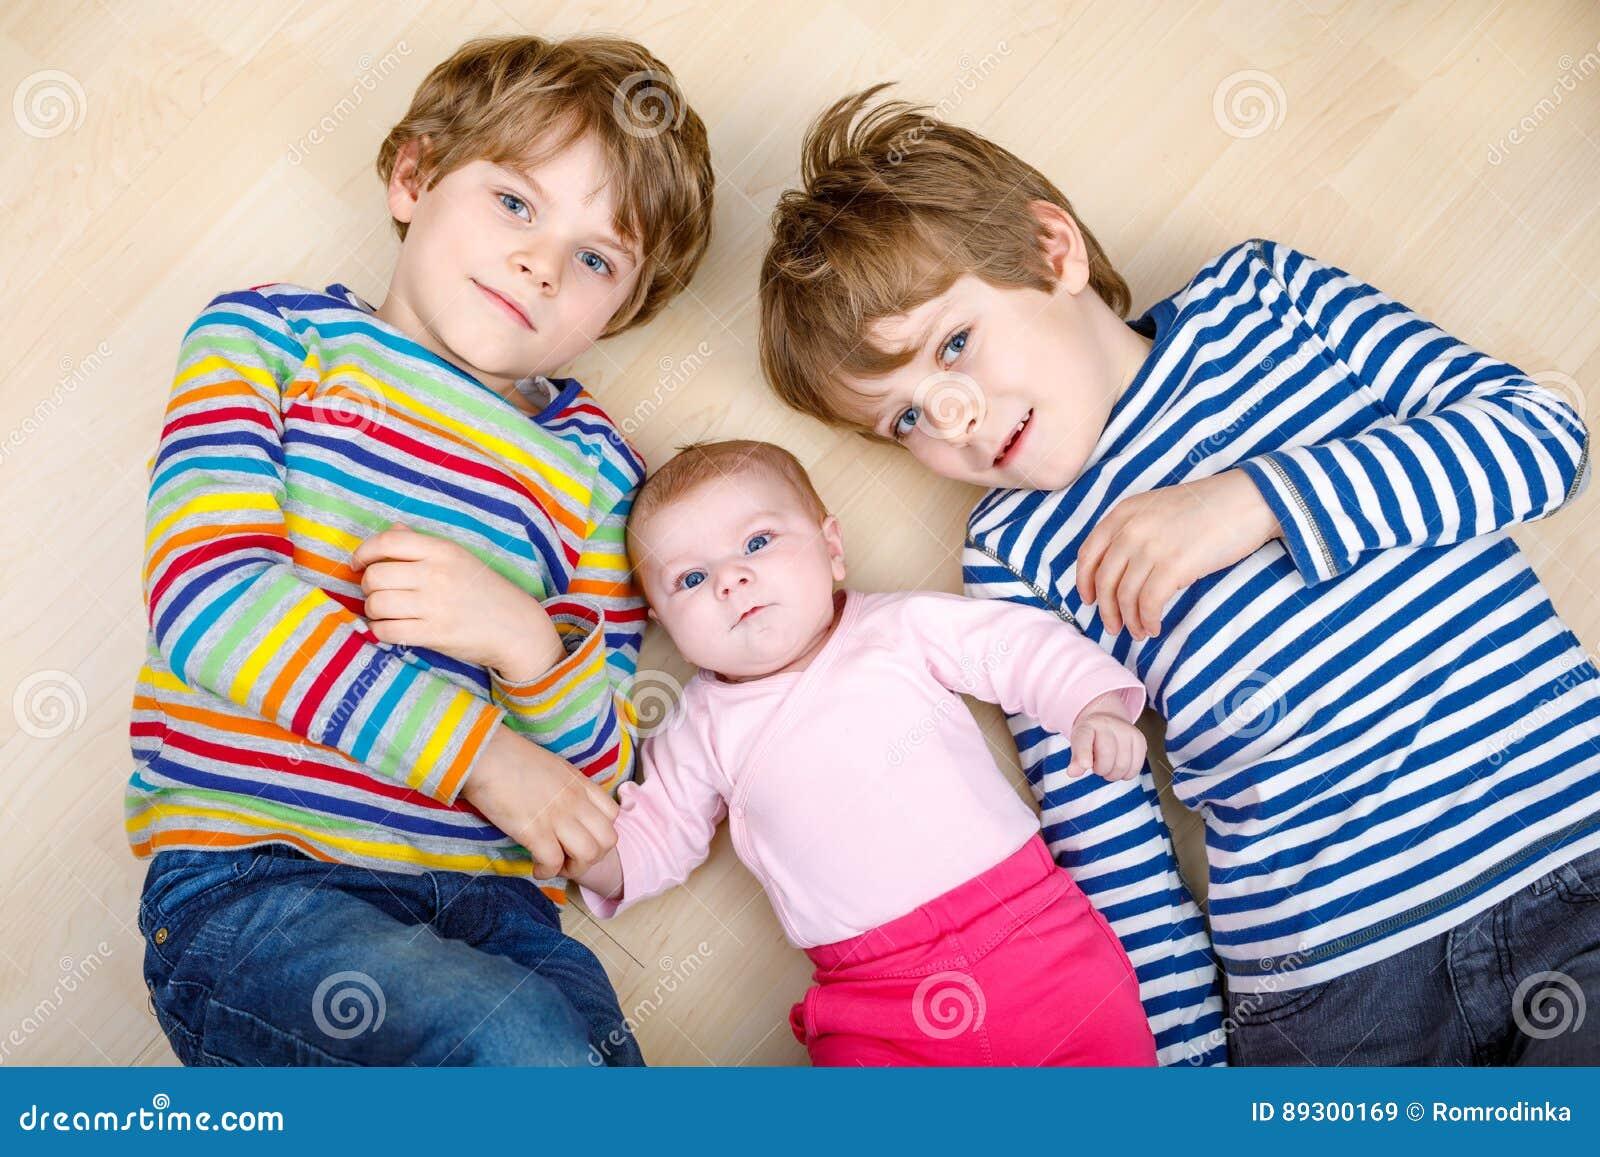 3966e5f09 Two Happy Little Preschool Kids Boys With Newborn Baby Girl Stock ...